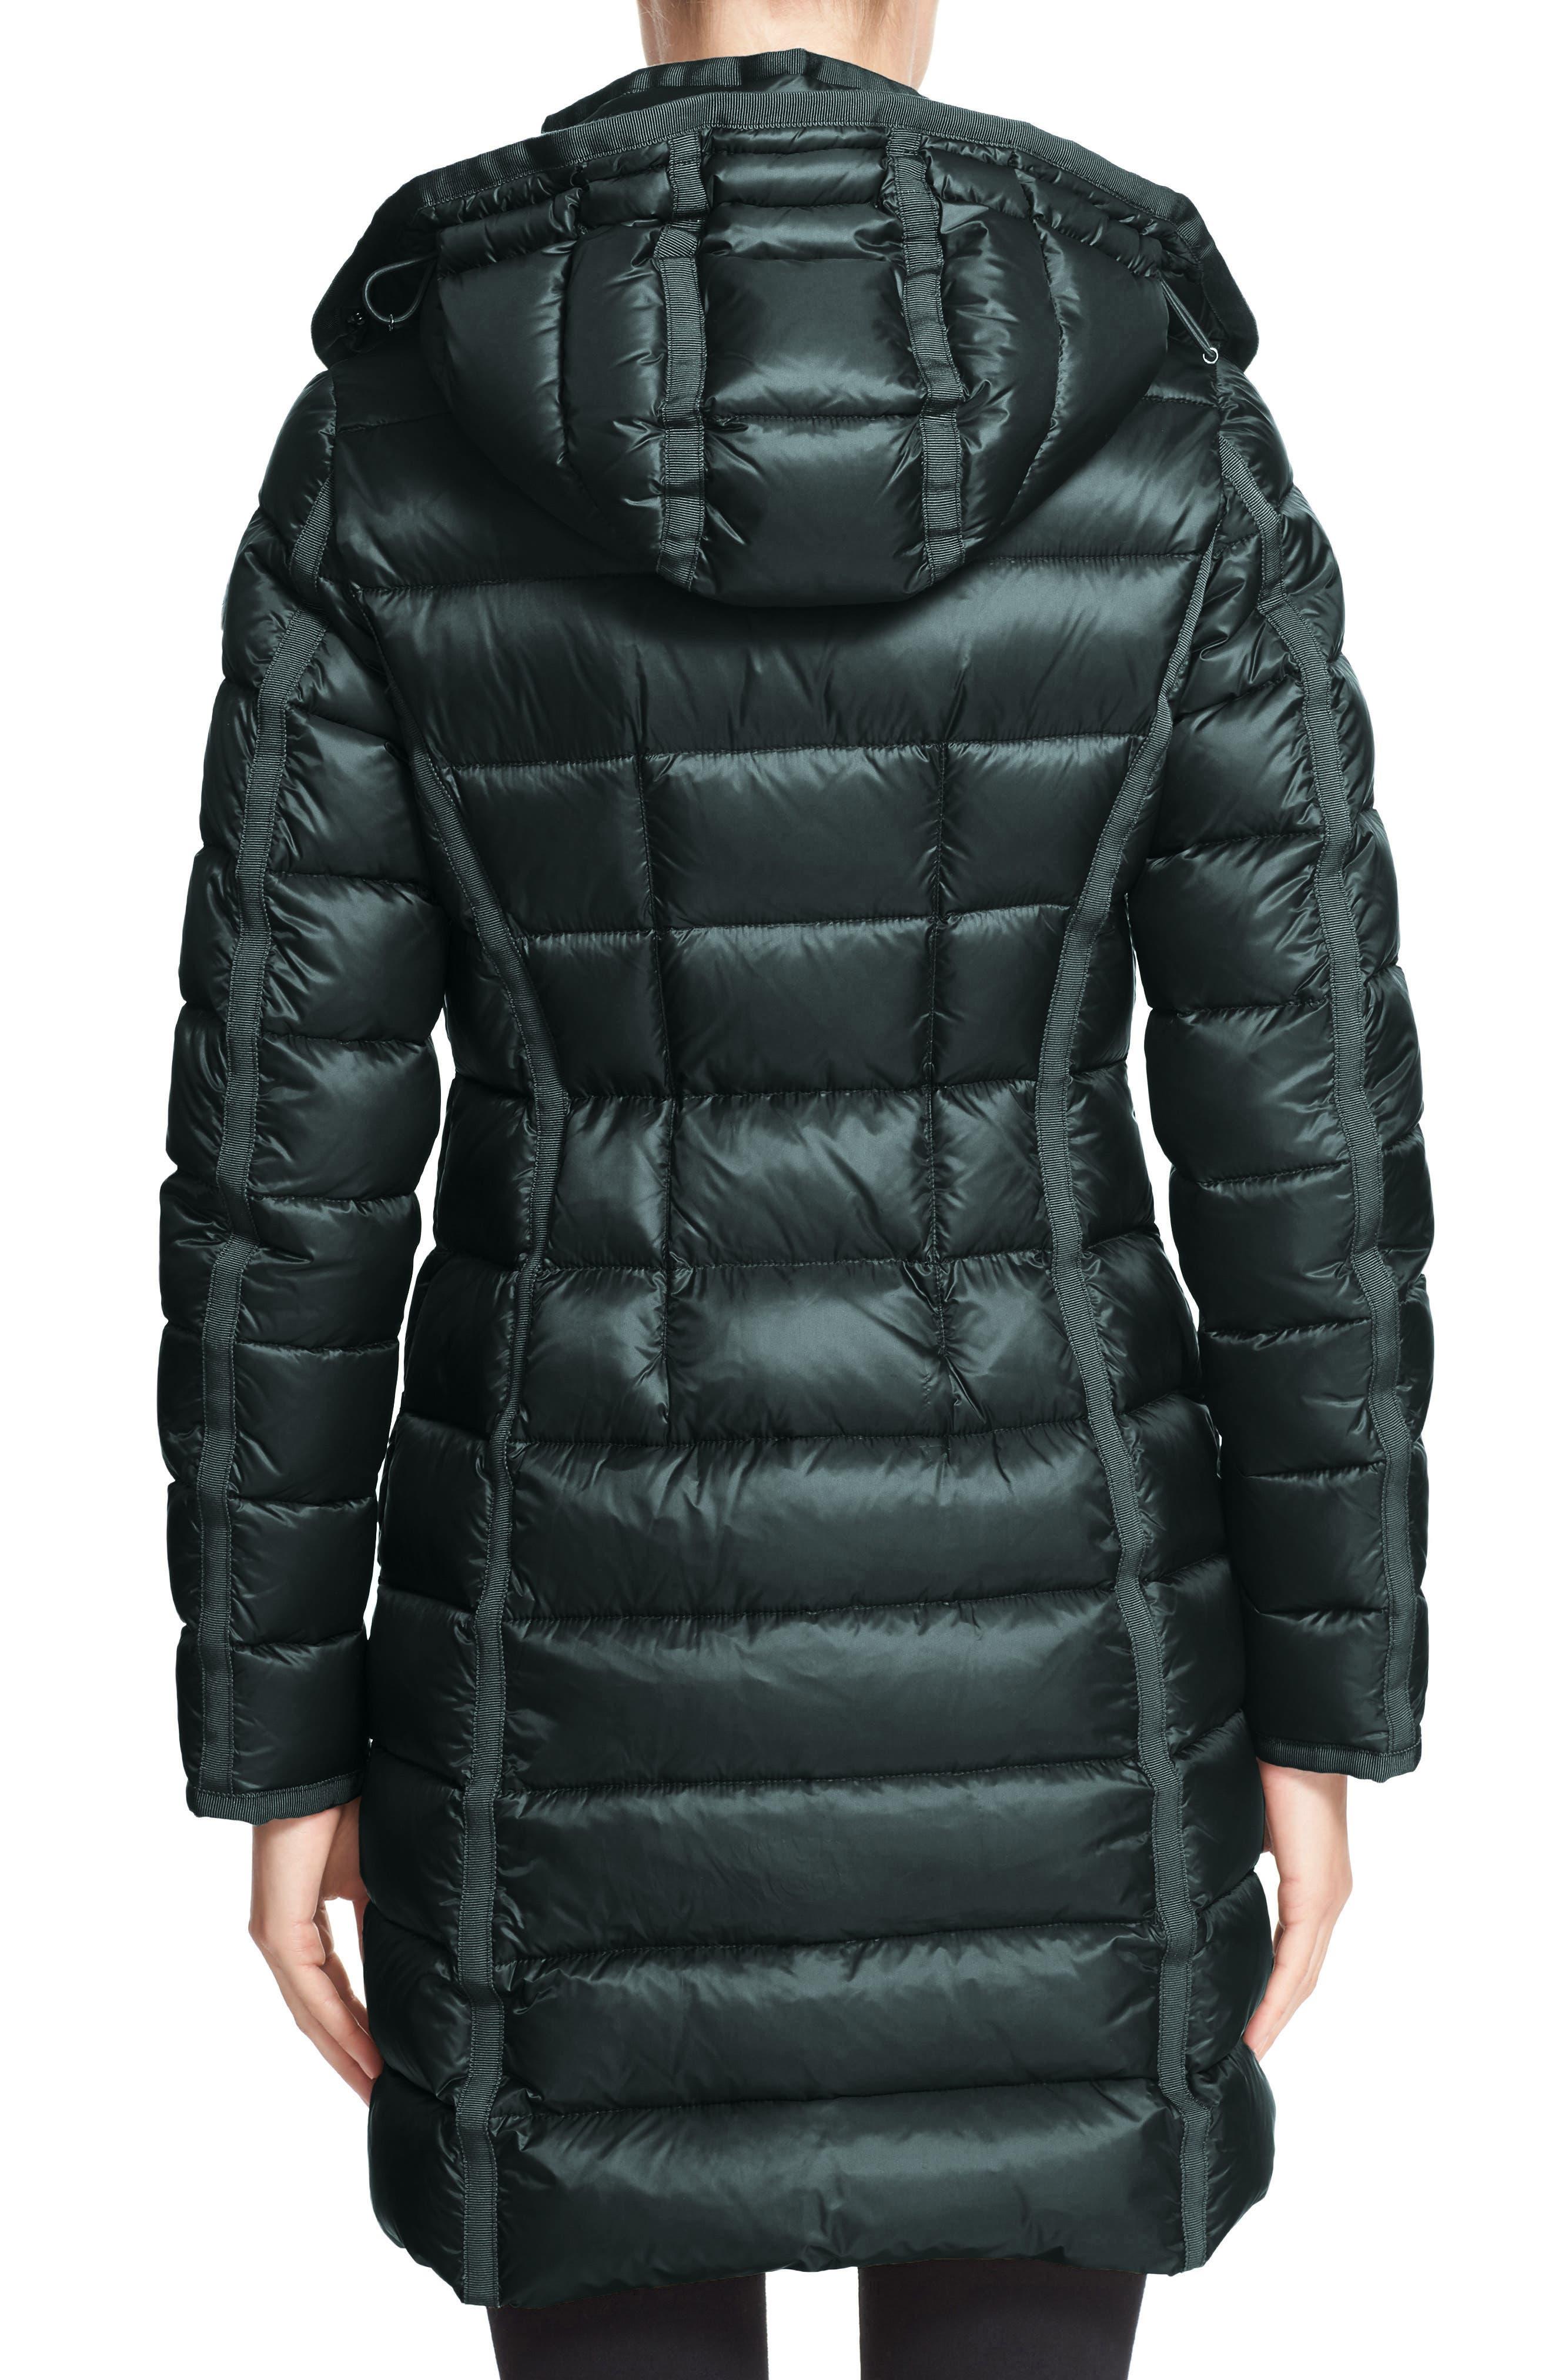 moncler coat price